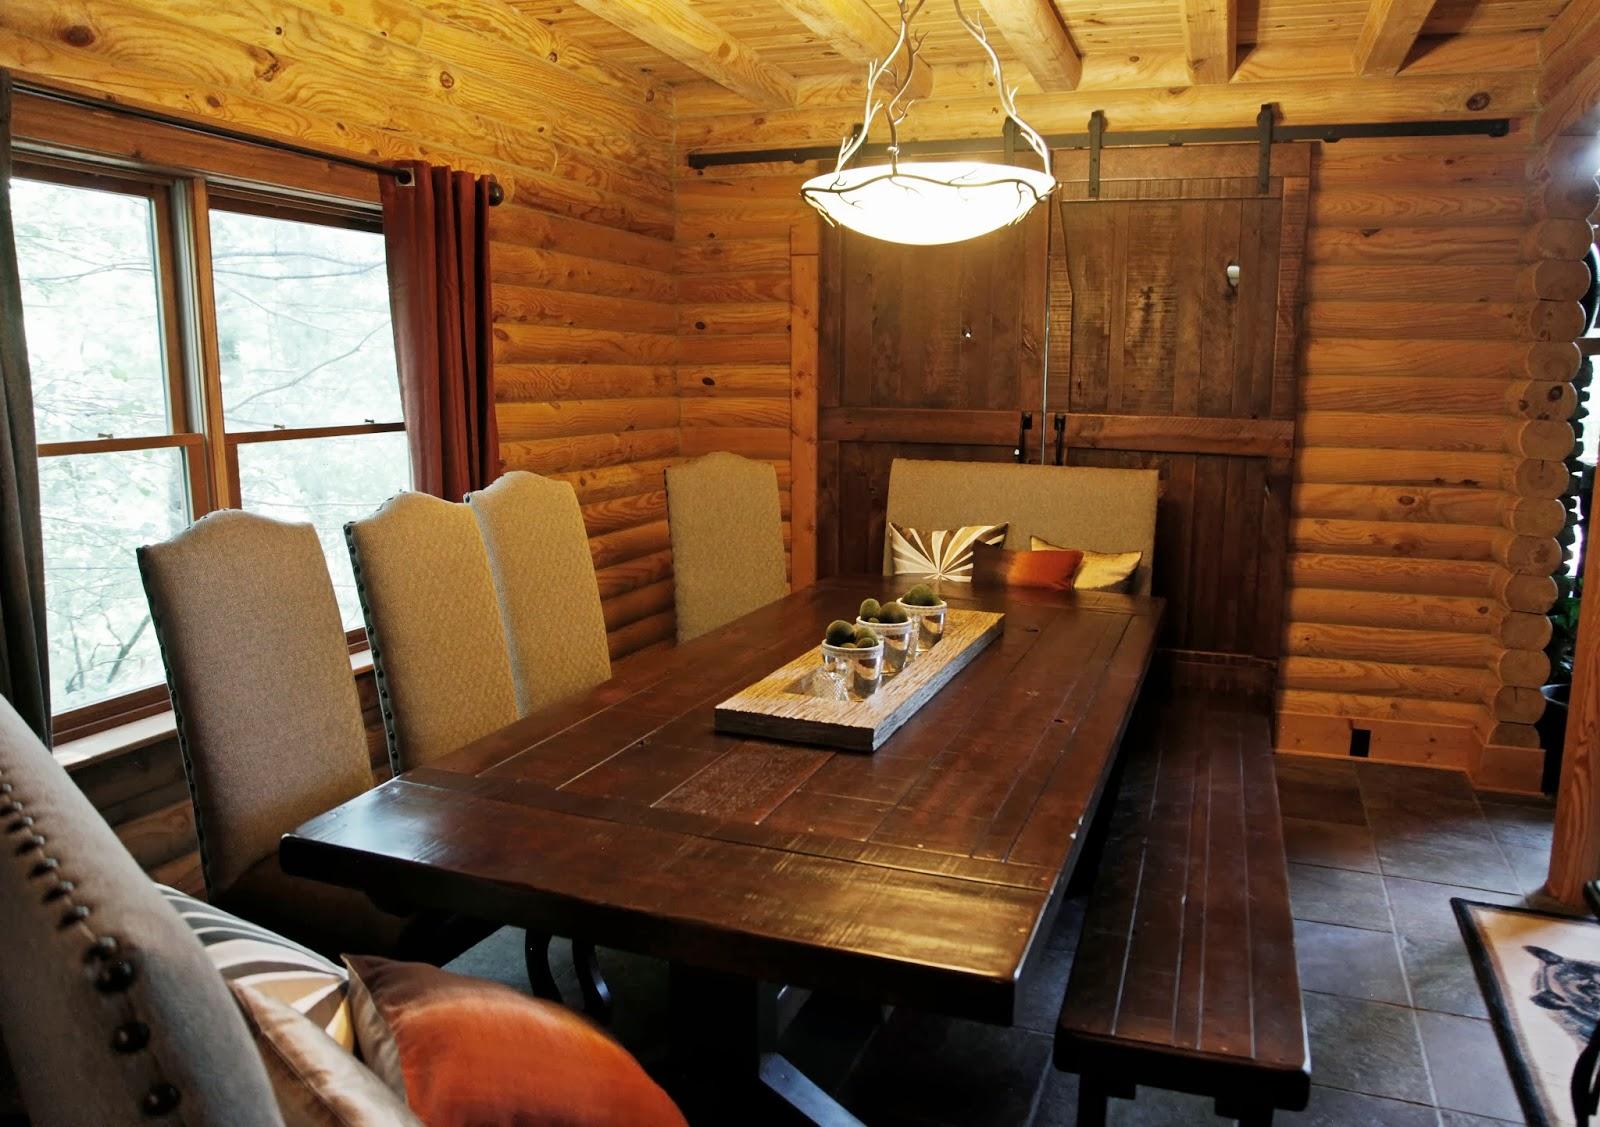 Sliding Barn Doors Emerson Trestle Rustic Trades Furniture